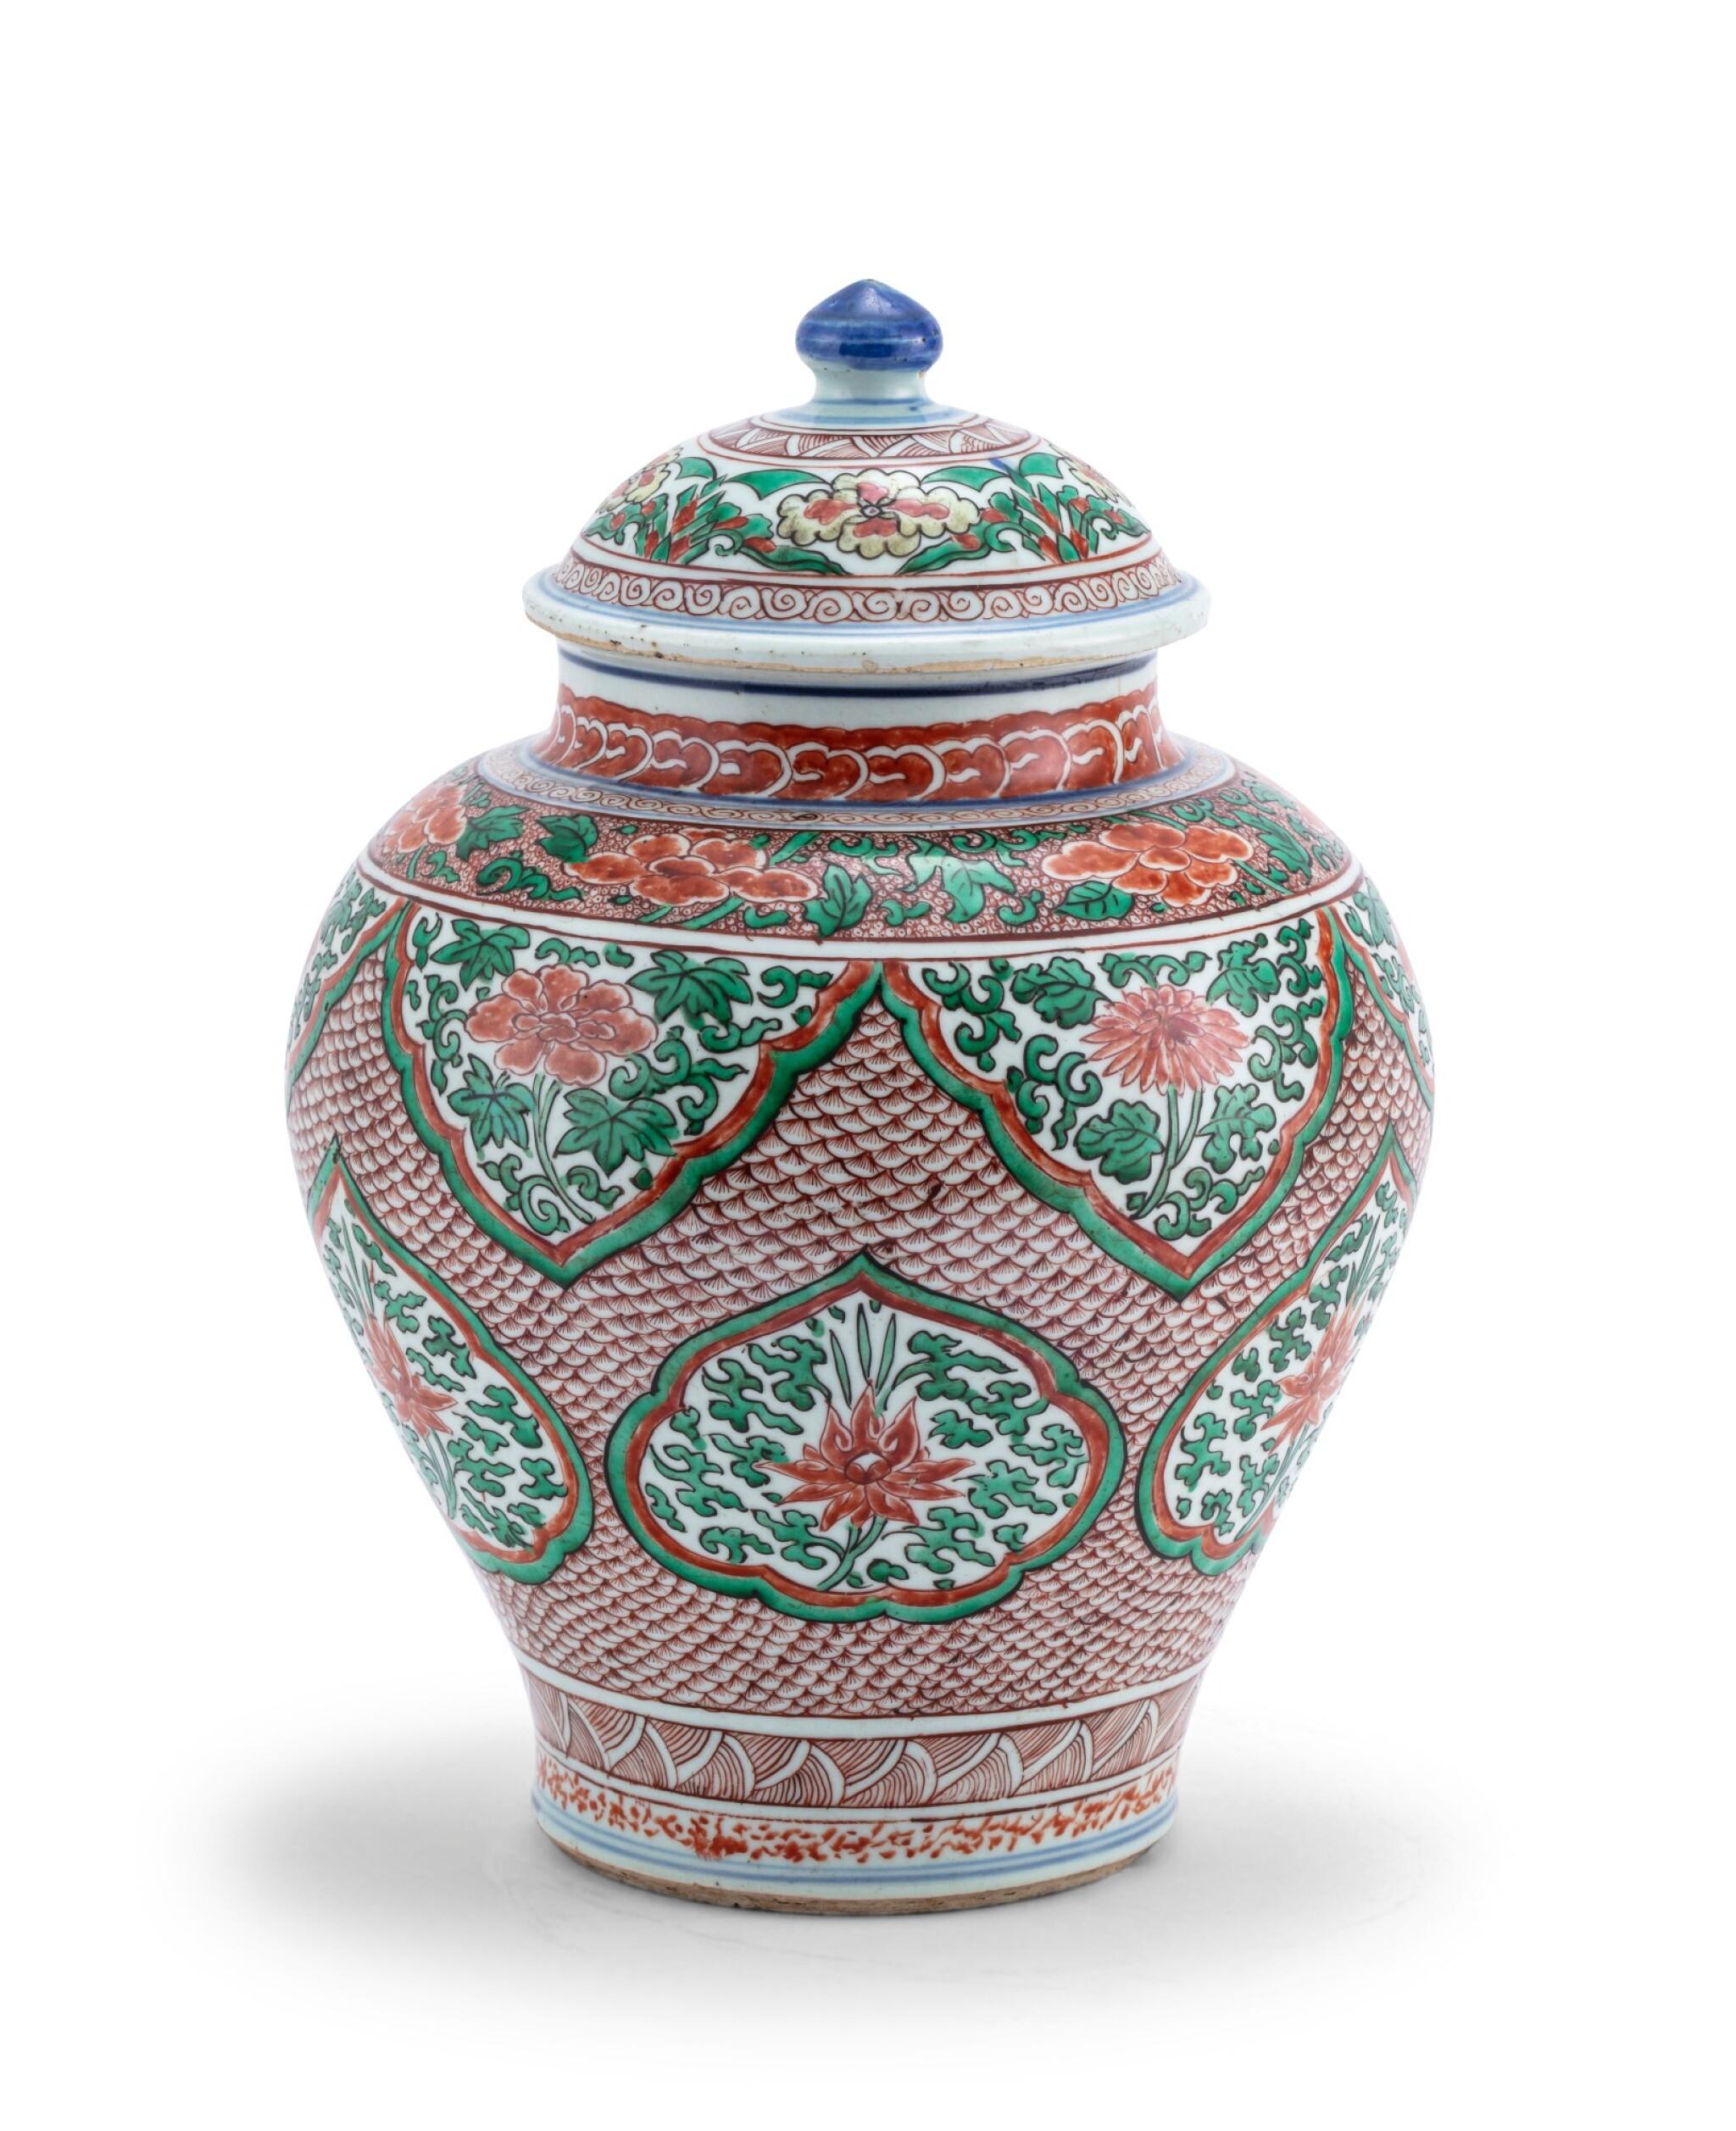 View 1 of Lot 155. Vase couvert en porcelaine wucai XVIIE siècle | 十七世紀 五彩開光花卉紋將軍罐 | A wucai jar and cover, 17th century .